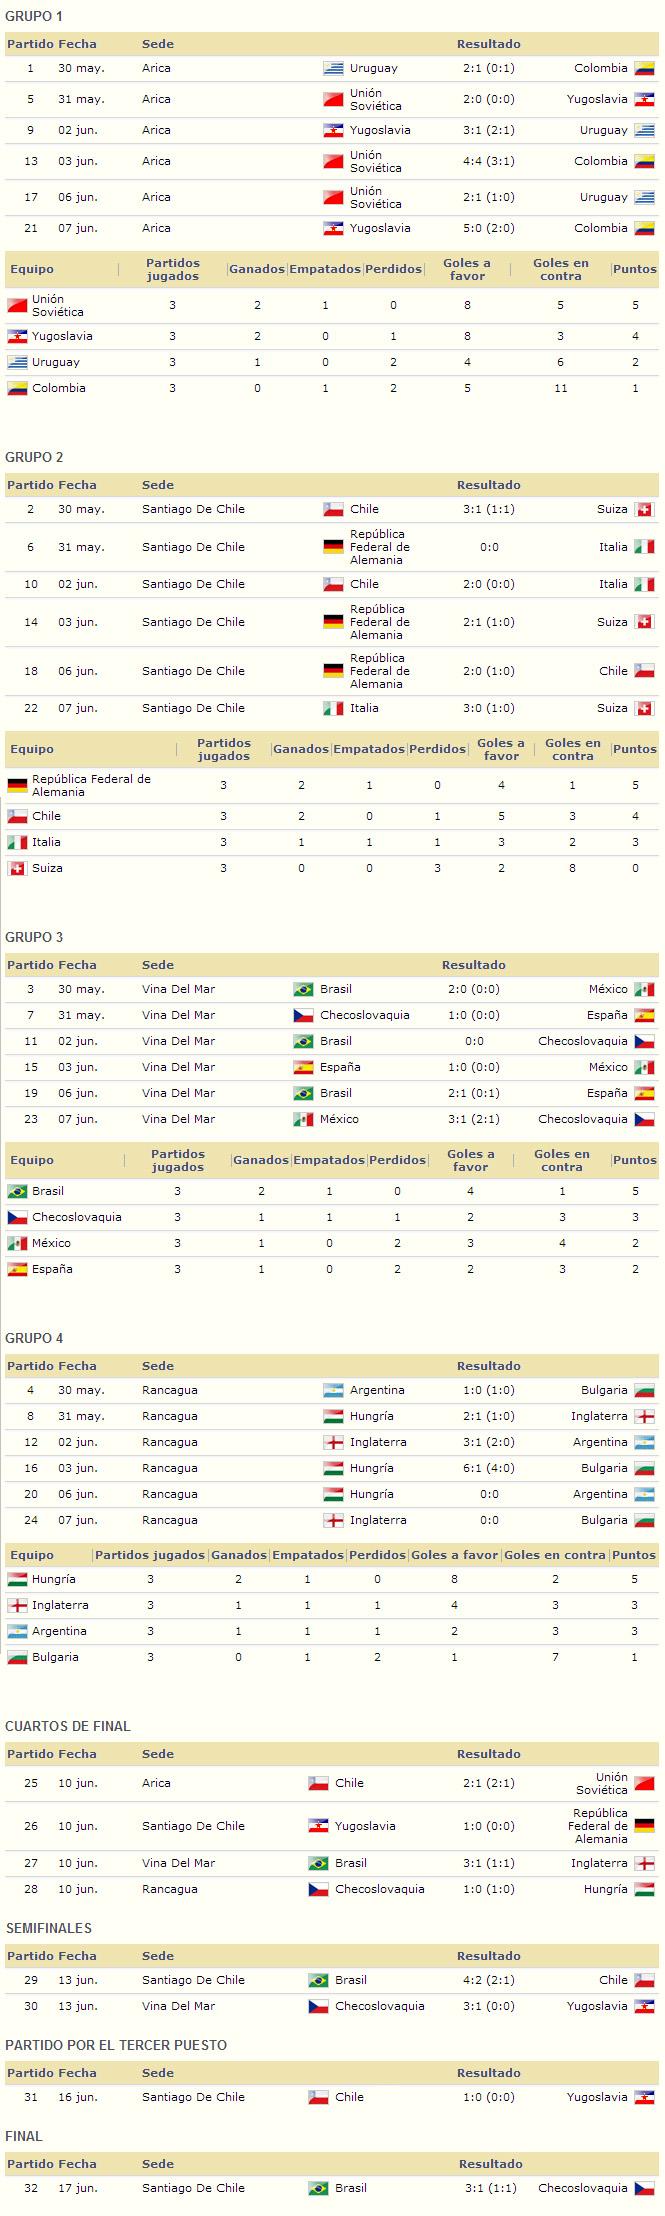 Mundial Chile 1962 resultados